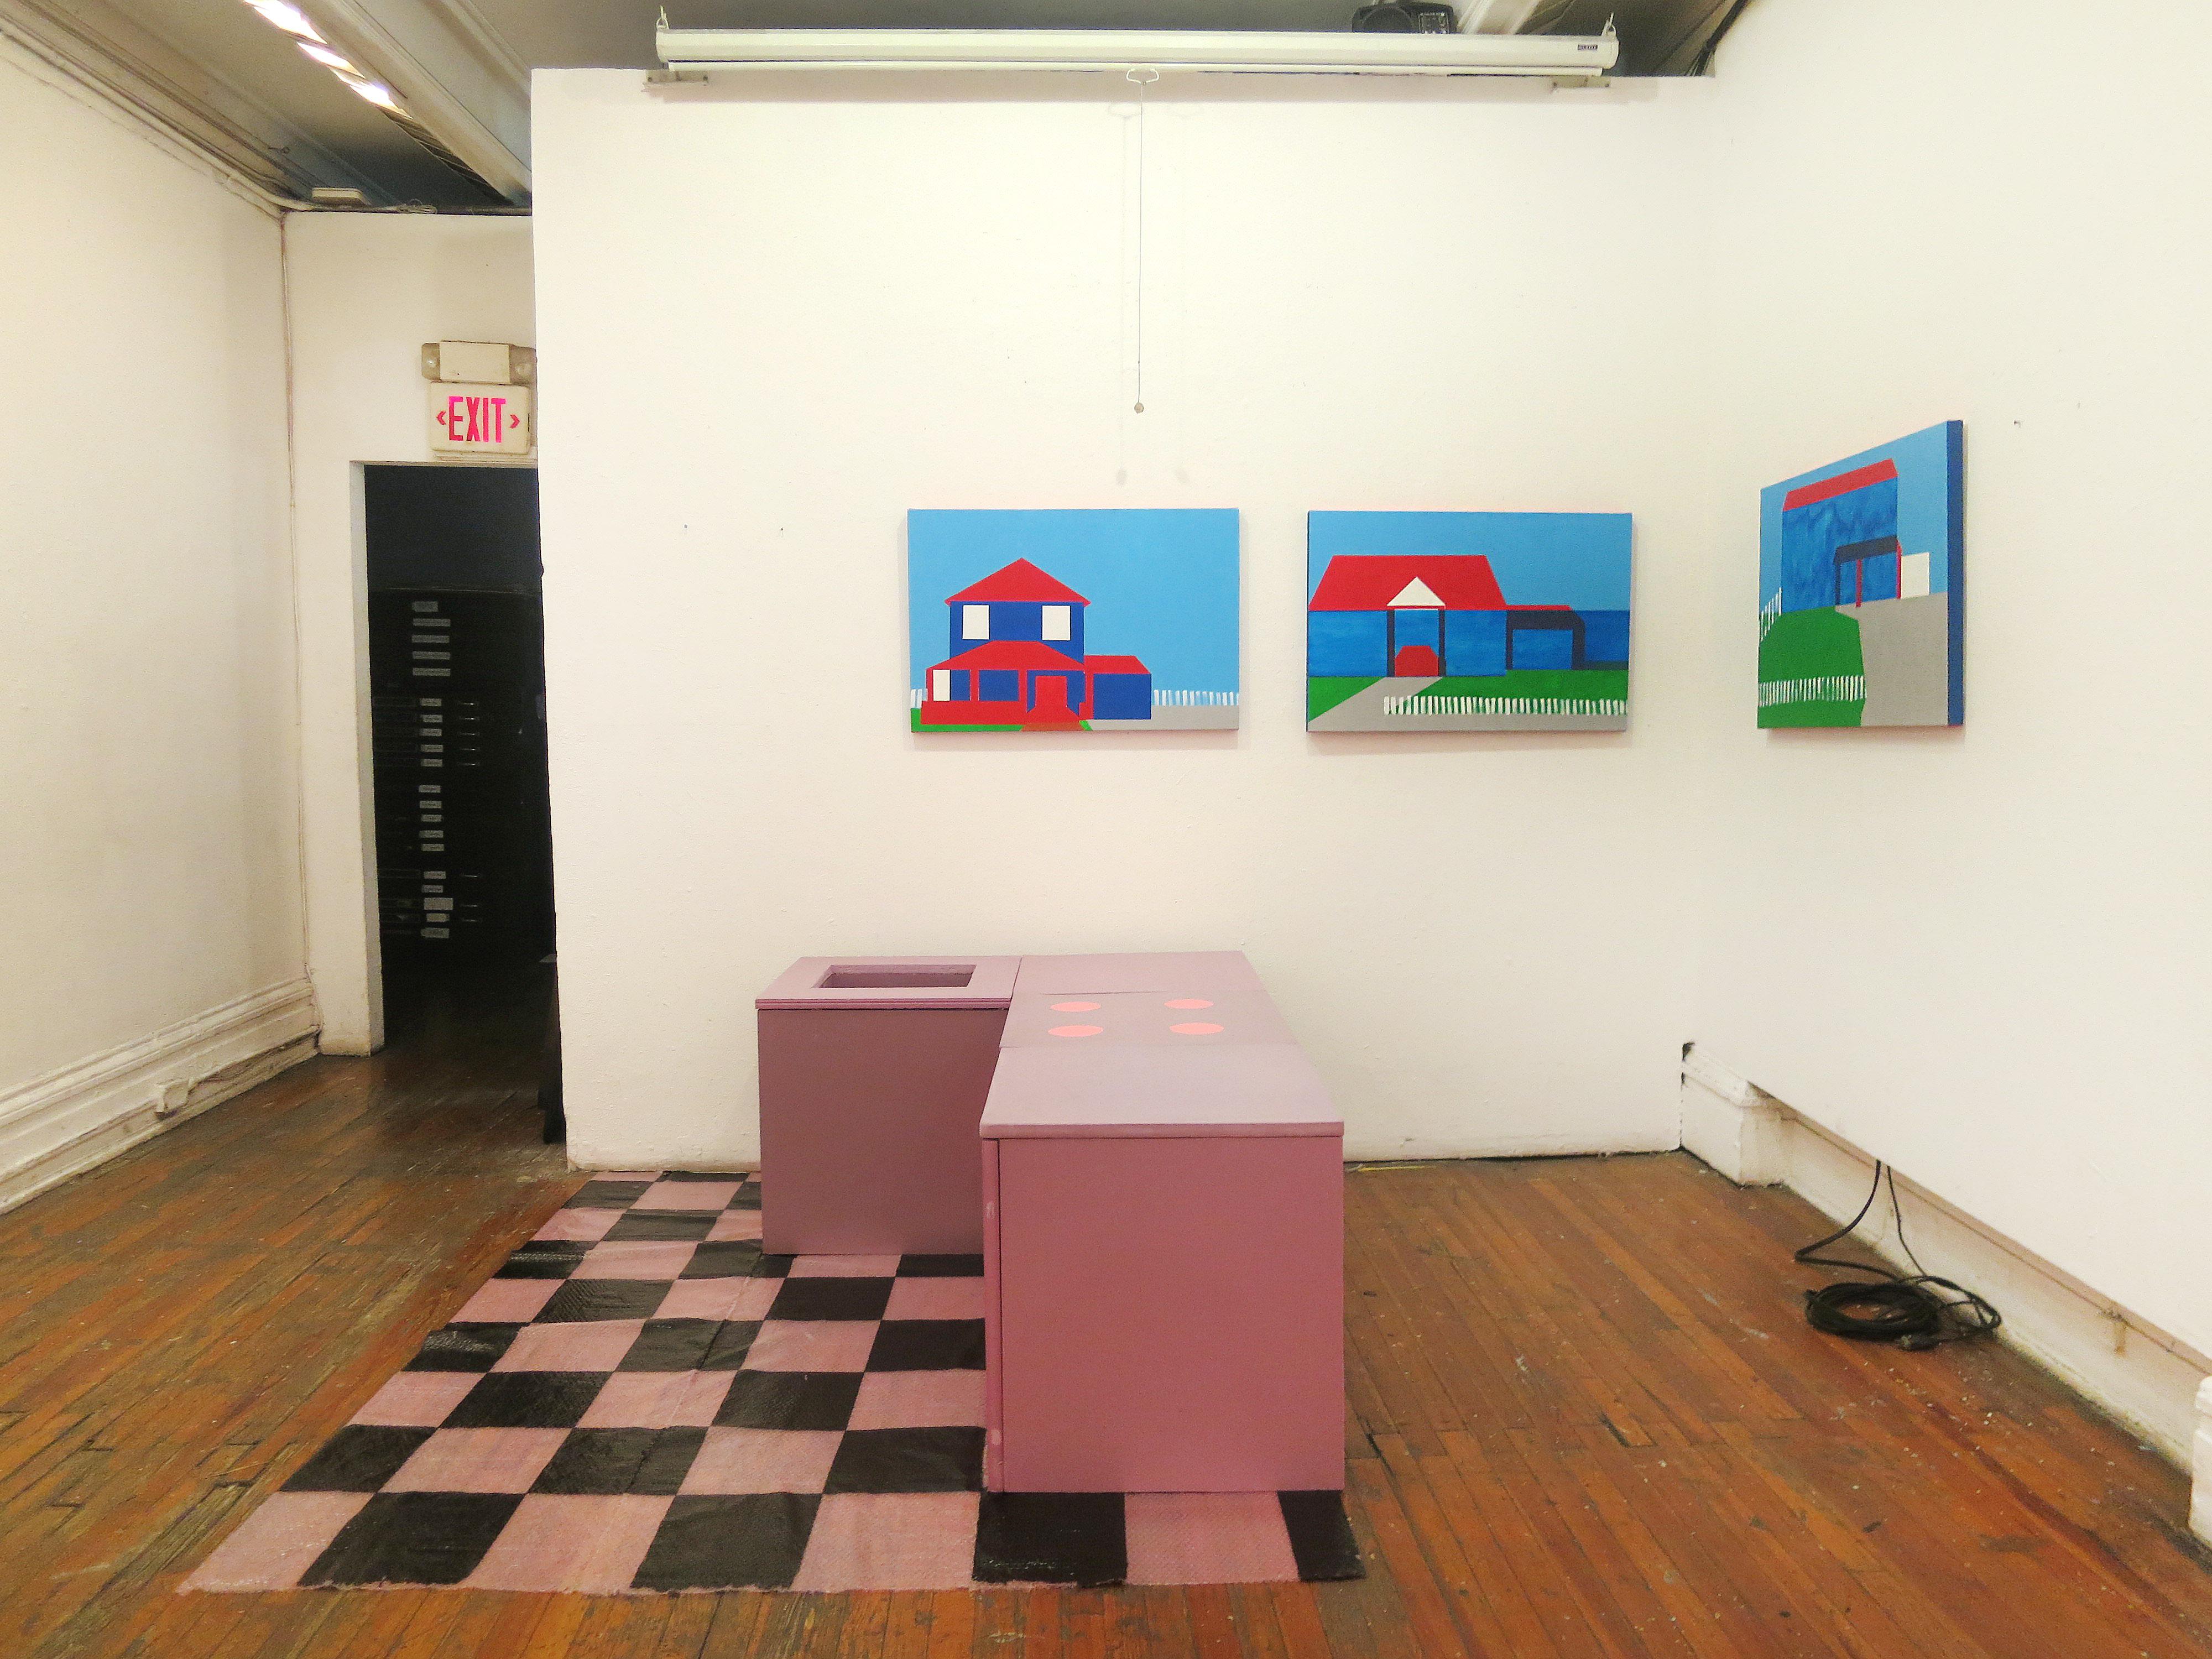 Solo exhibition at New York Studio School